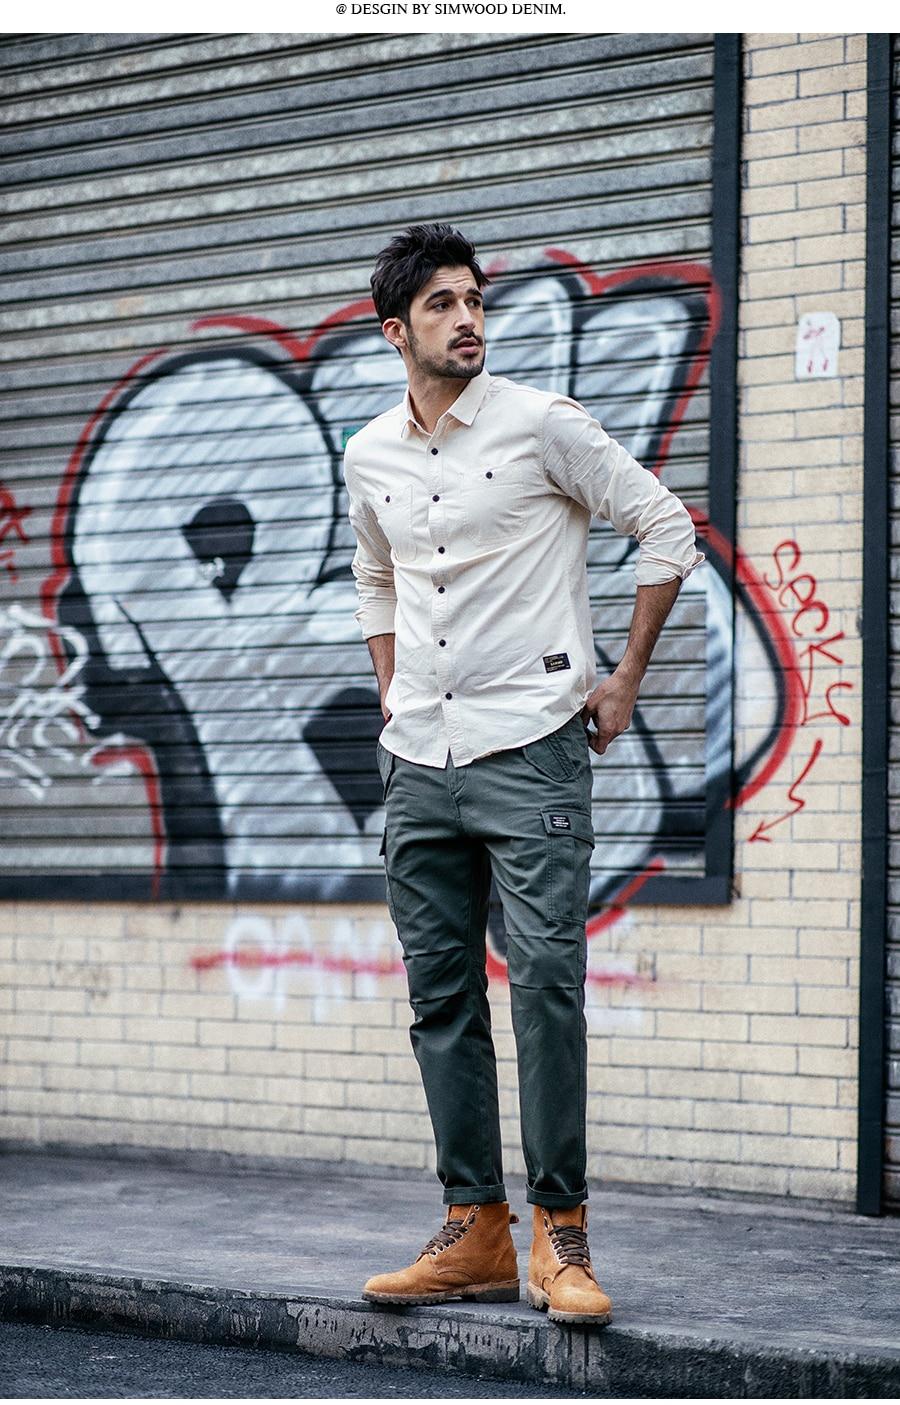 Hea81c2a33b17491cb4d7500b4c1c8a6er SIMWOOD New 2019 Casual Pants Men Fashion track Cargo Pants Ankle-Length military autumn Trousers Men pantalon hombre 180614